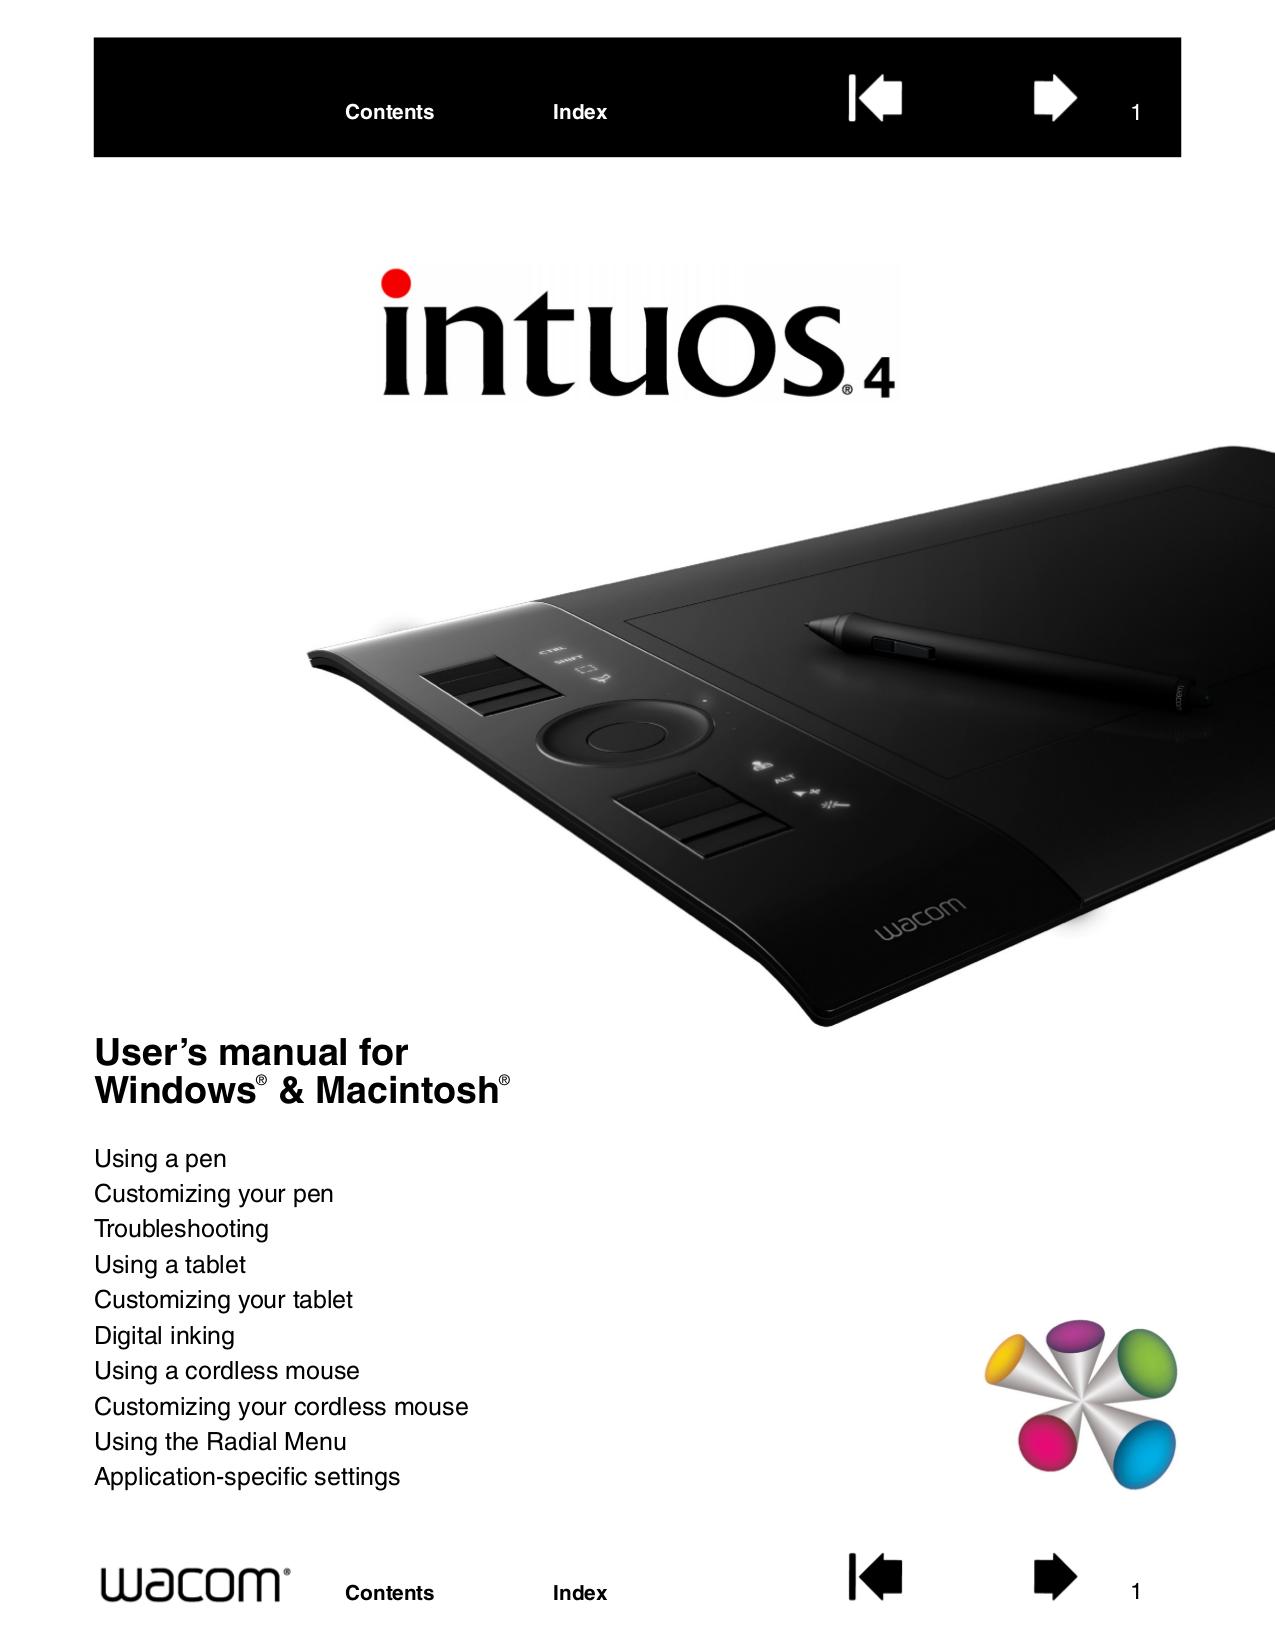 pdf for Wacom Mouse Intuos4 Medium manual